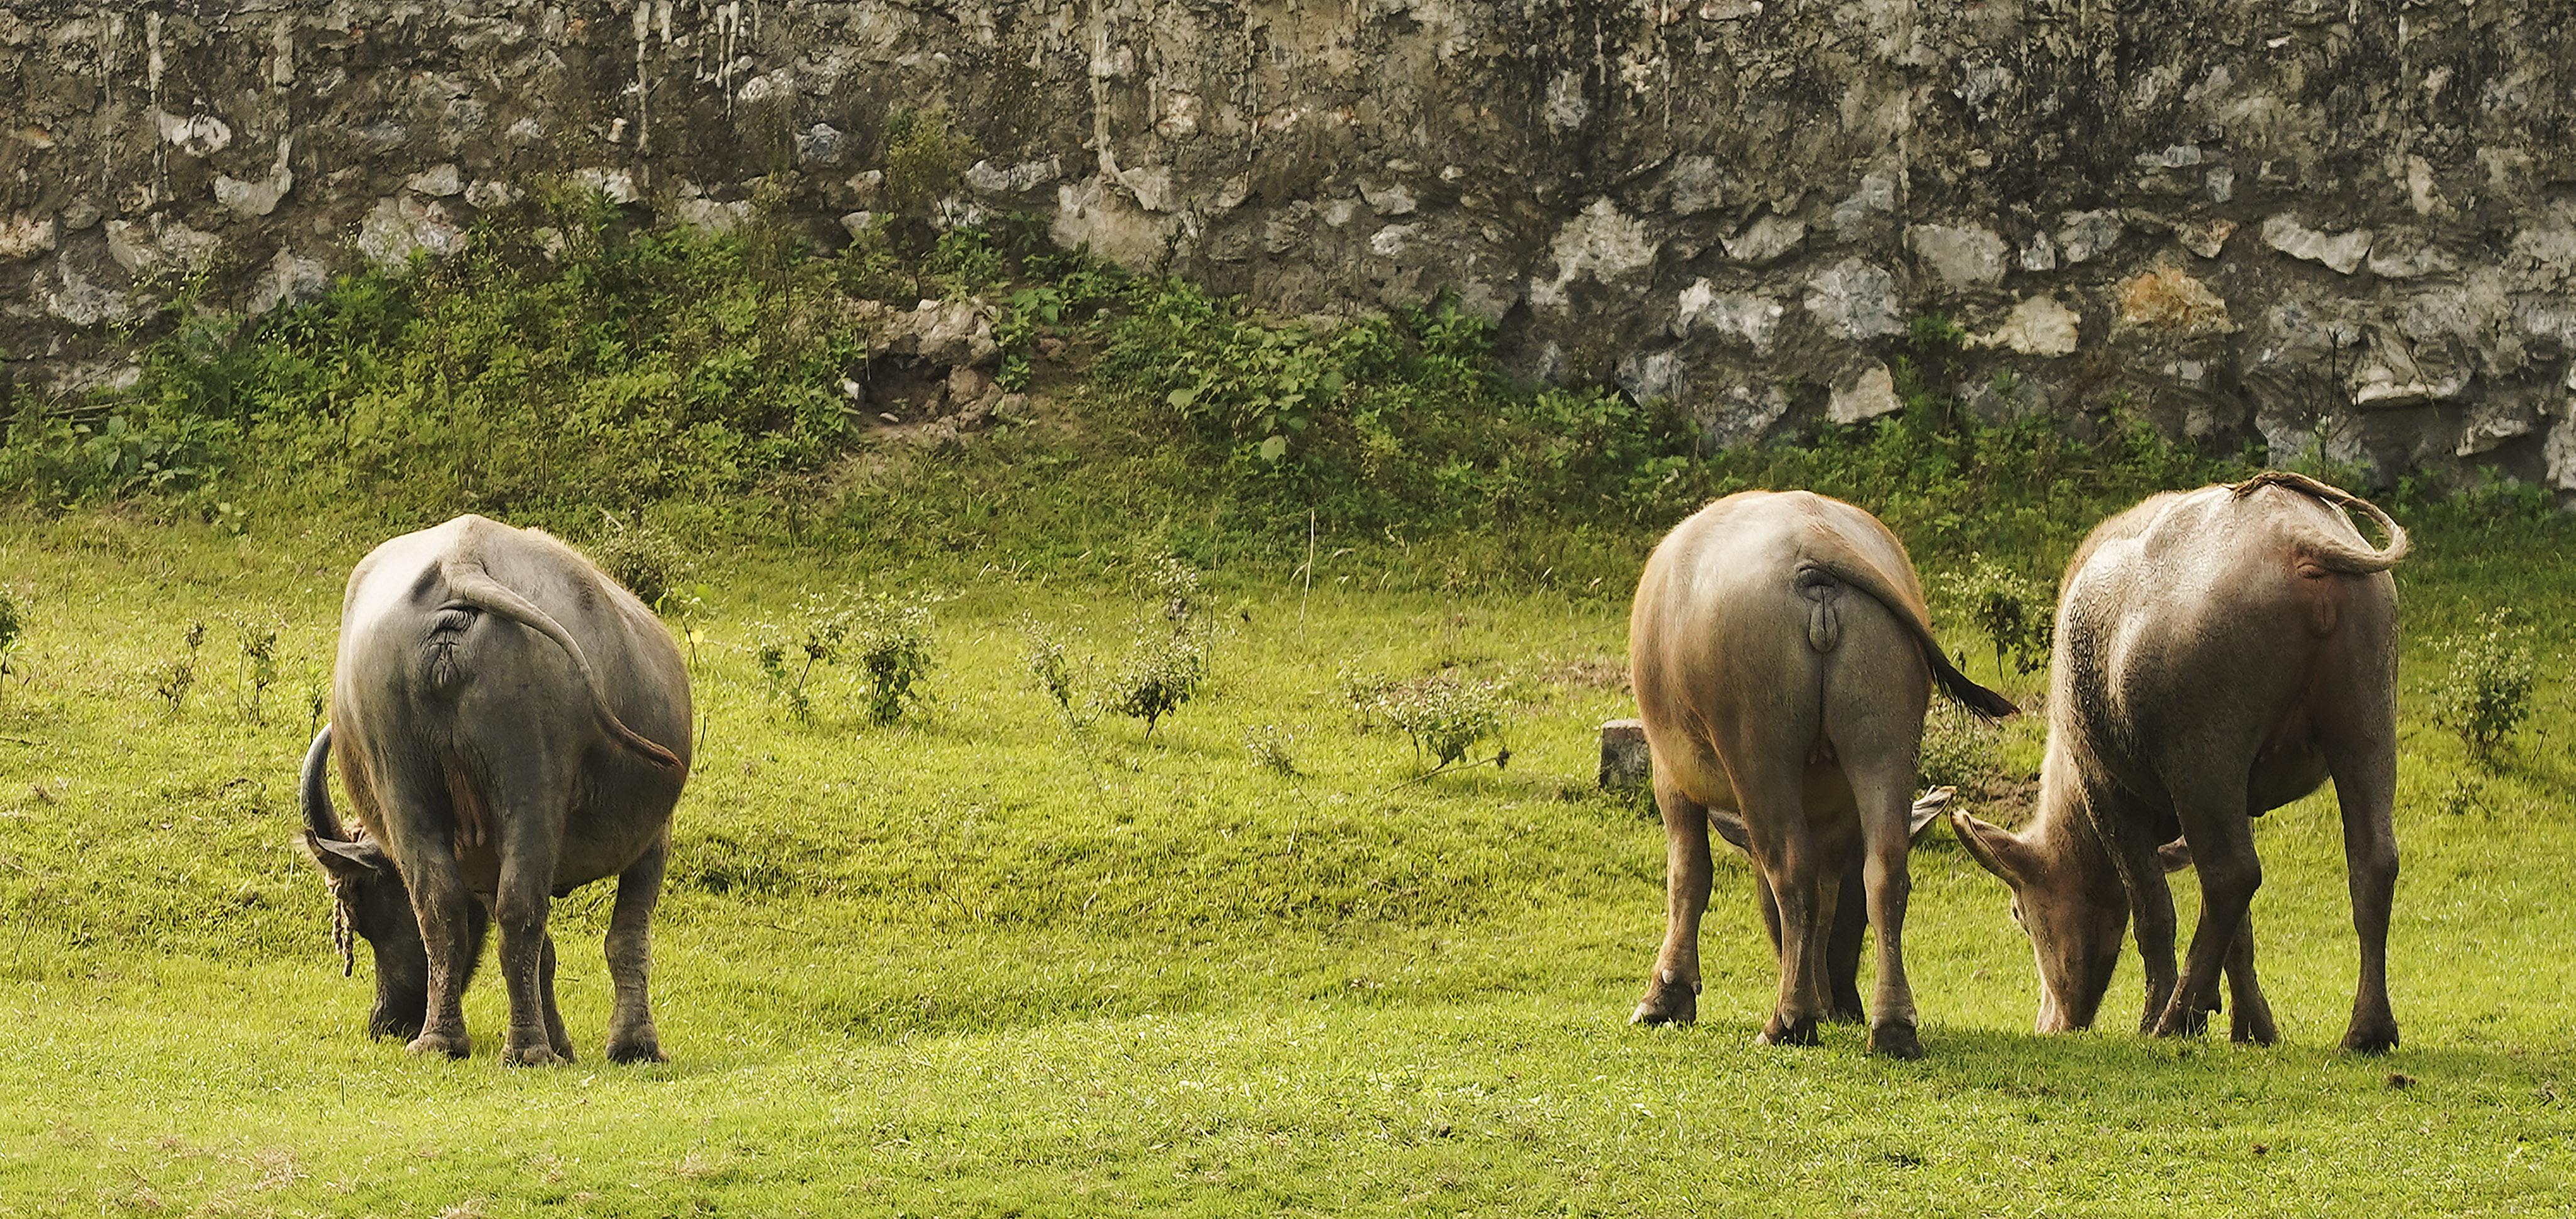 Water buffalo graze in Hanoi, Vietnam, on Saturday, Nov. 16, 2019.